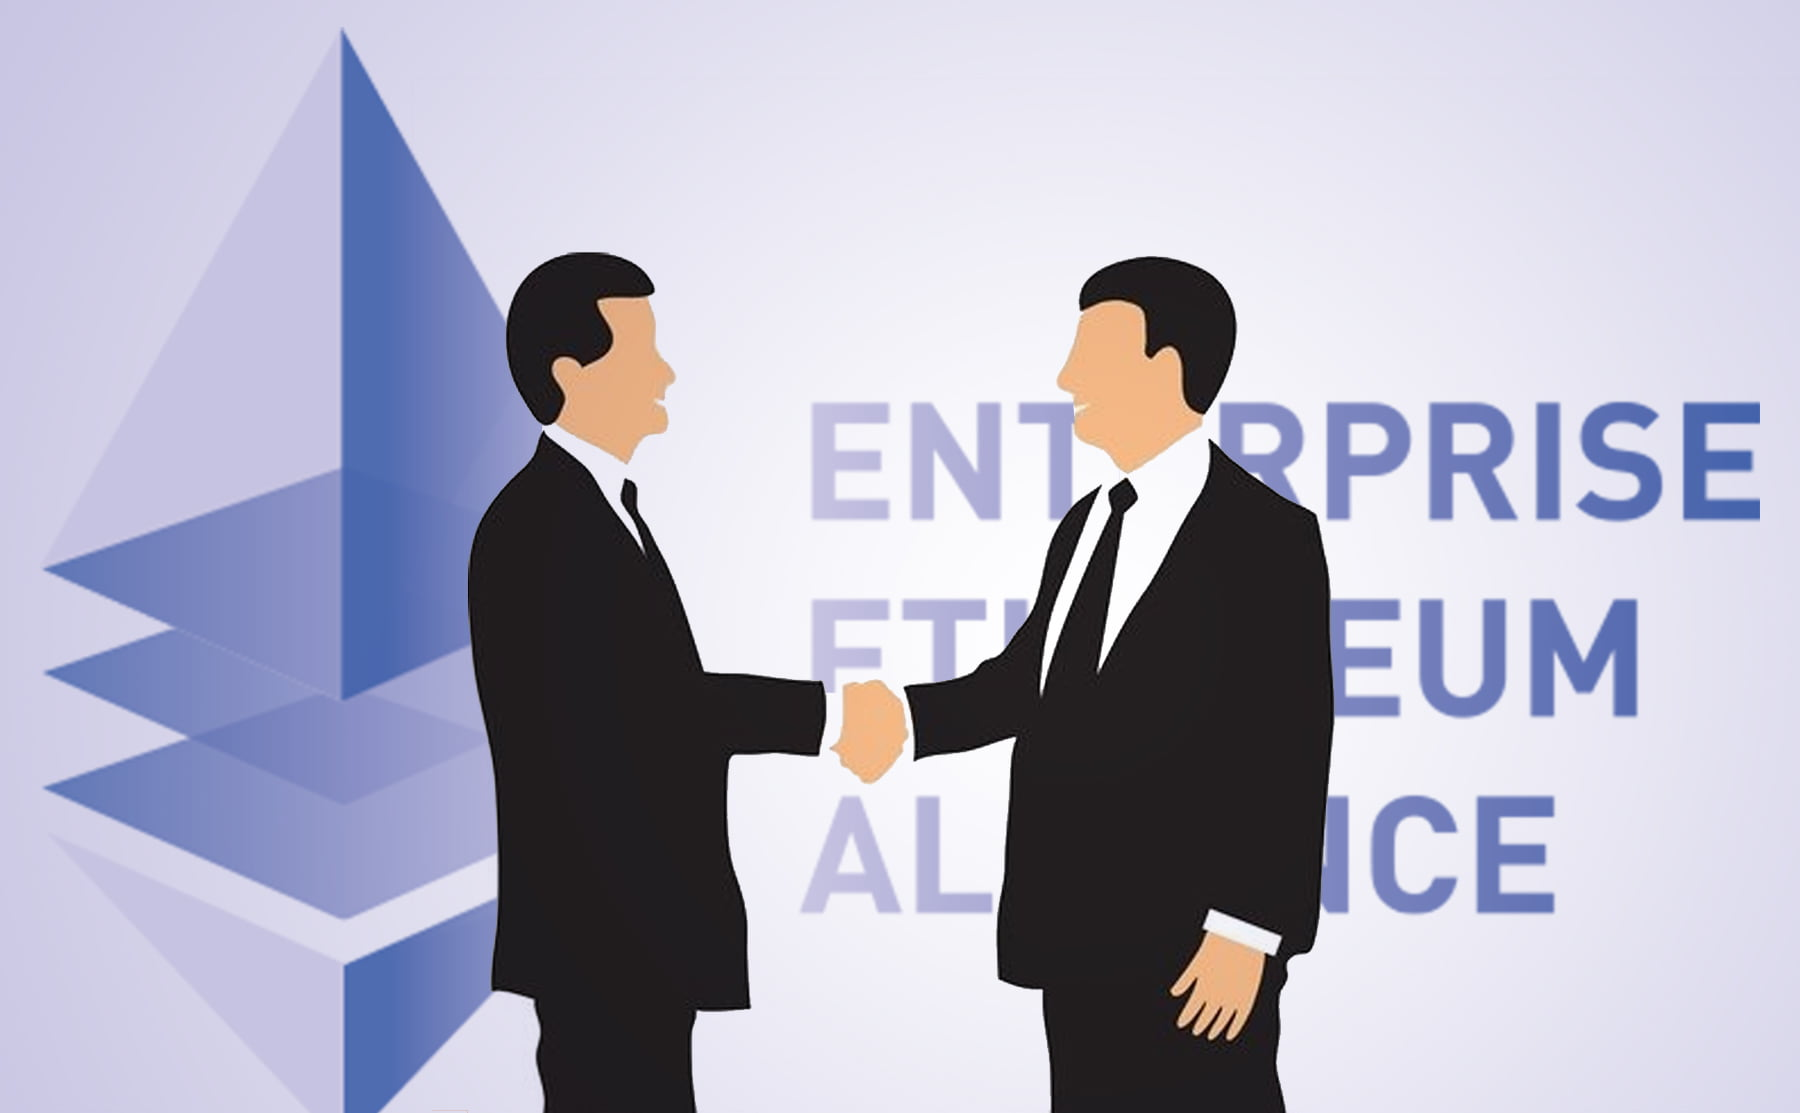 wipro, etheruem alliance, enterprise ethereum alliance